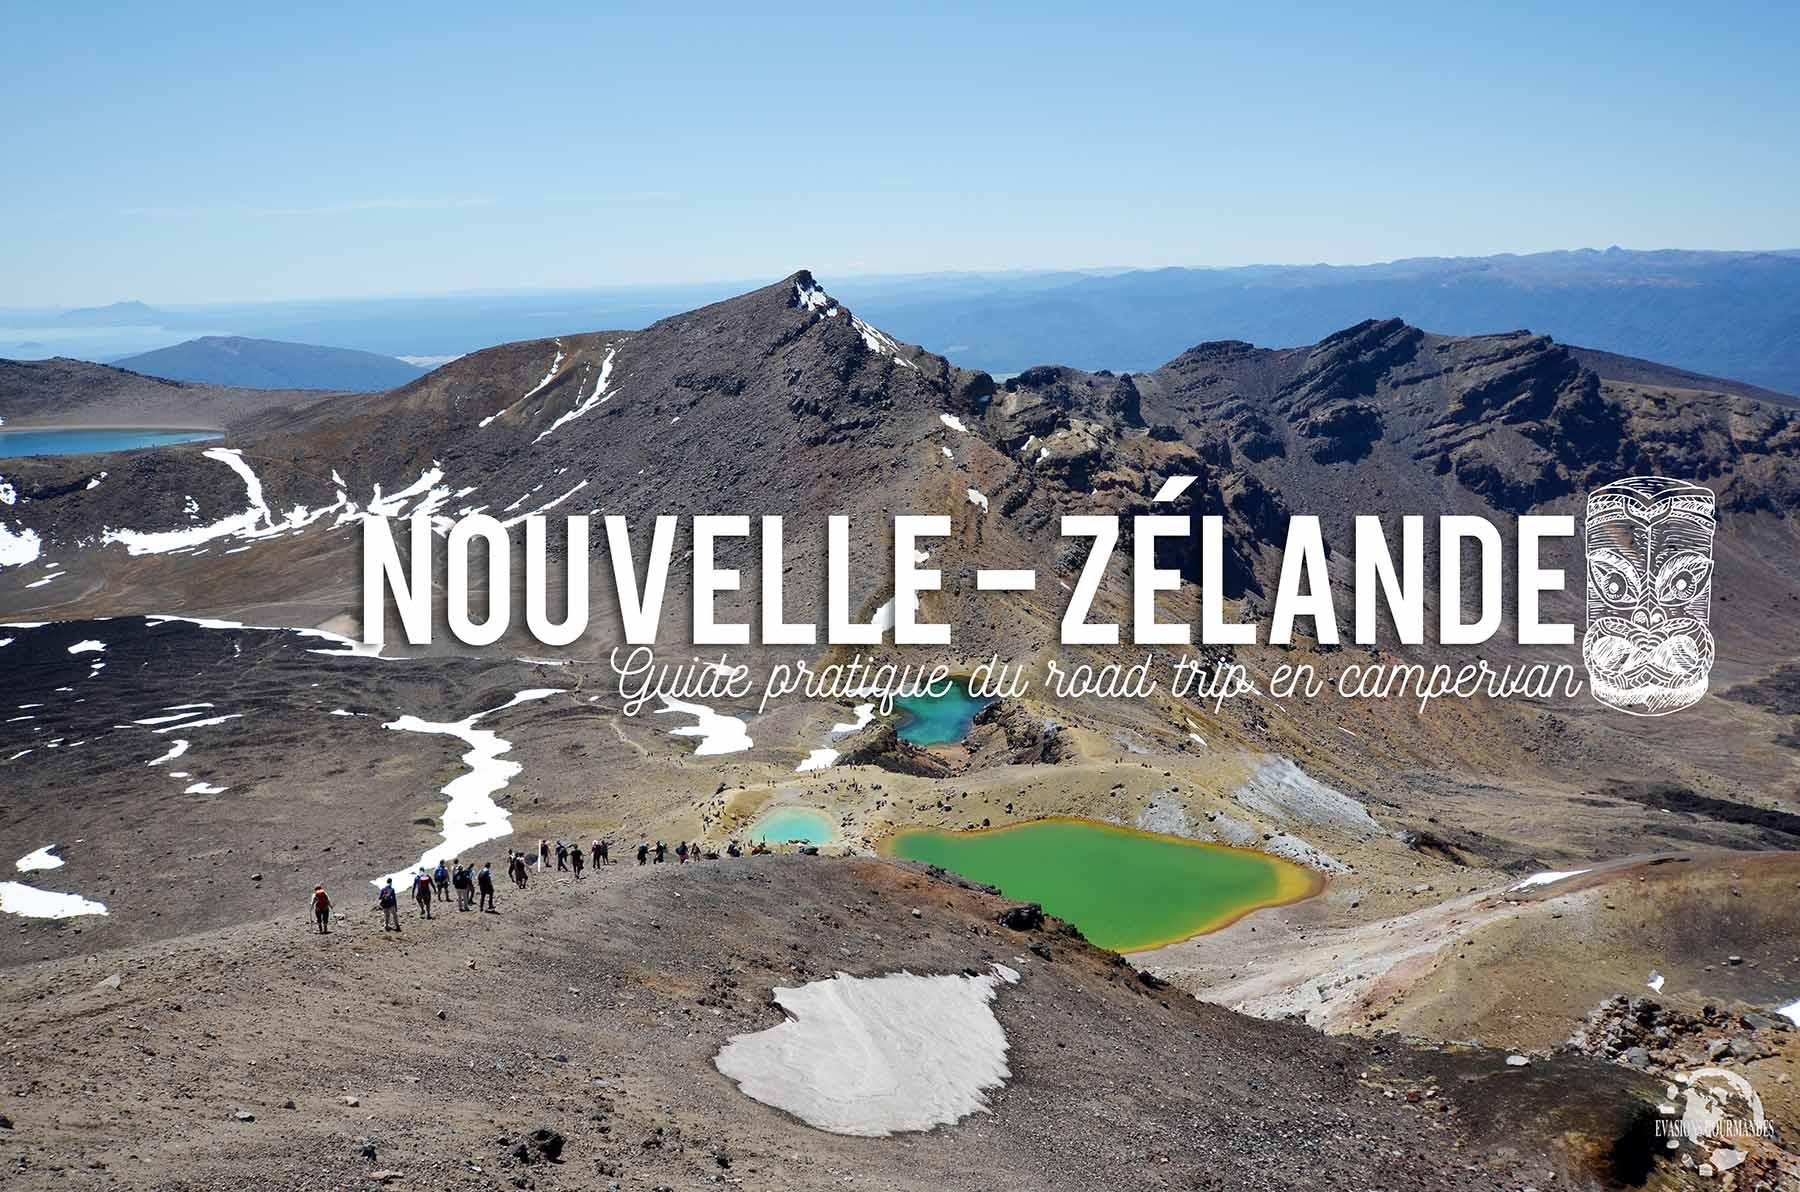 Road trip en van en Nouvelle-Zélande